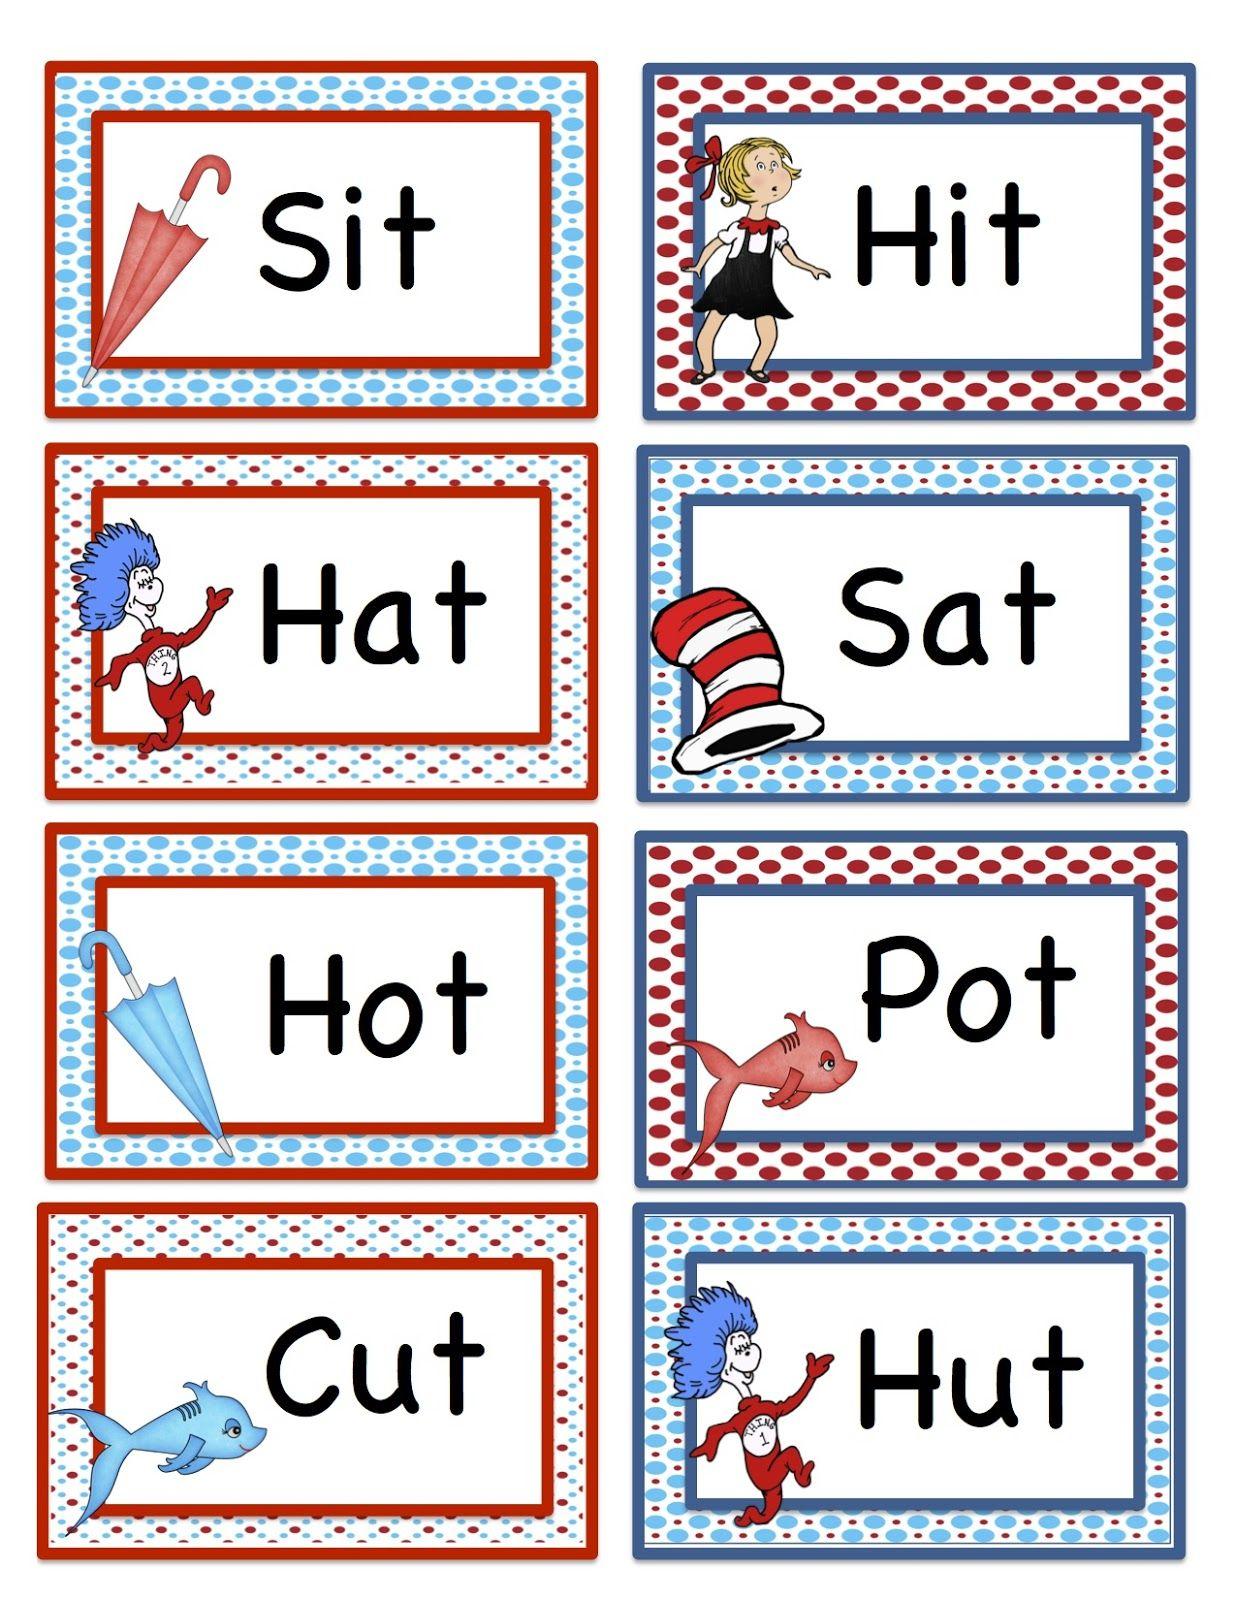 Preschool Printables: Seuss Rhyming Words Printable 2 | Fun for the ...